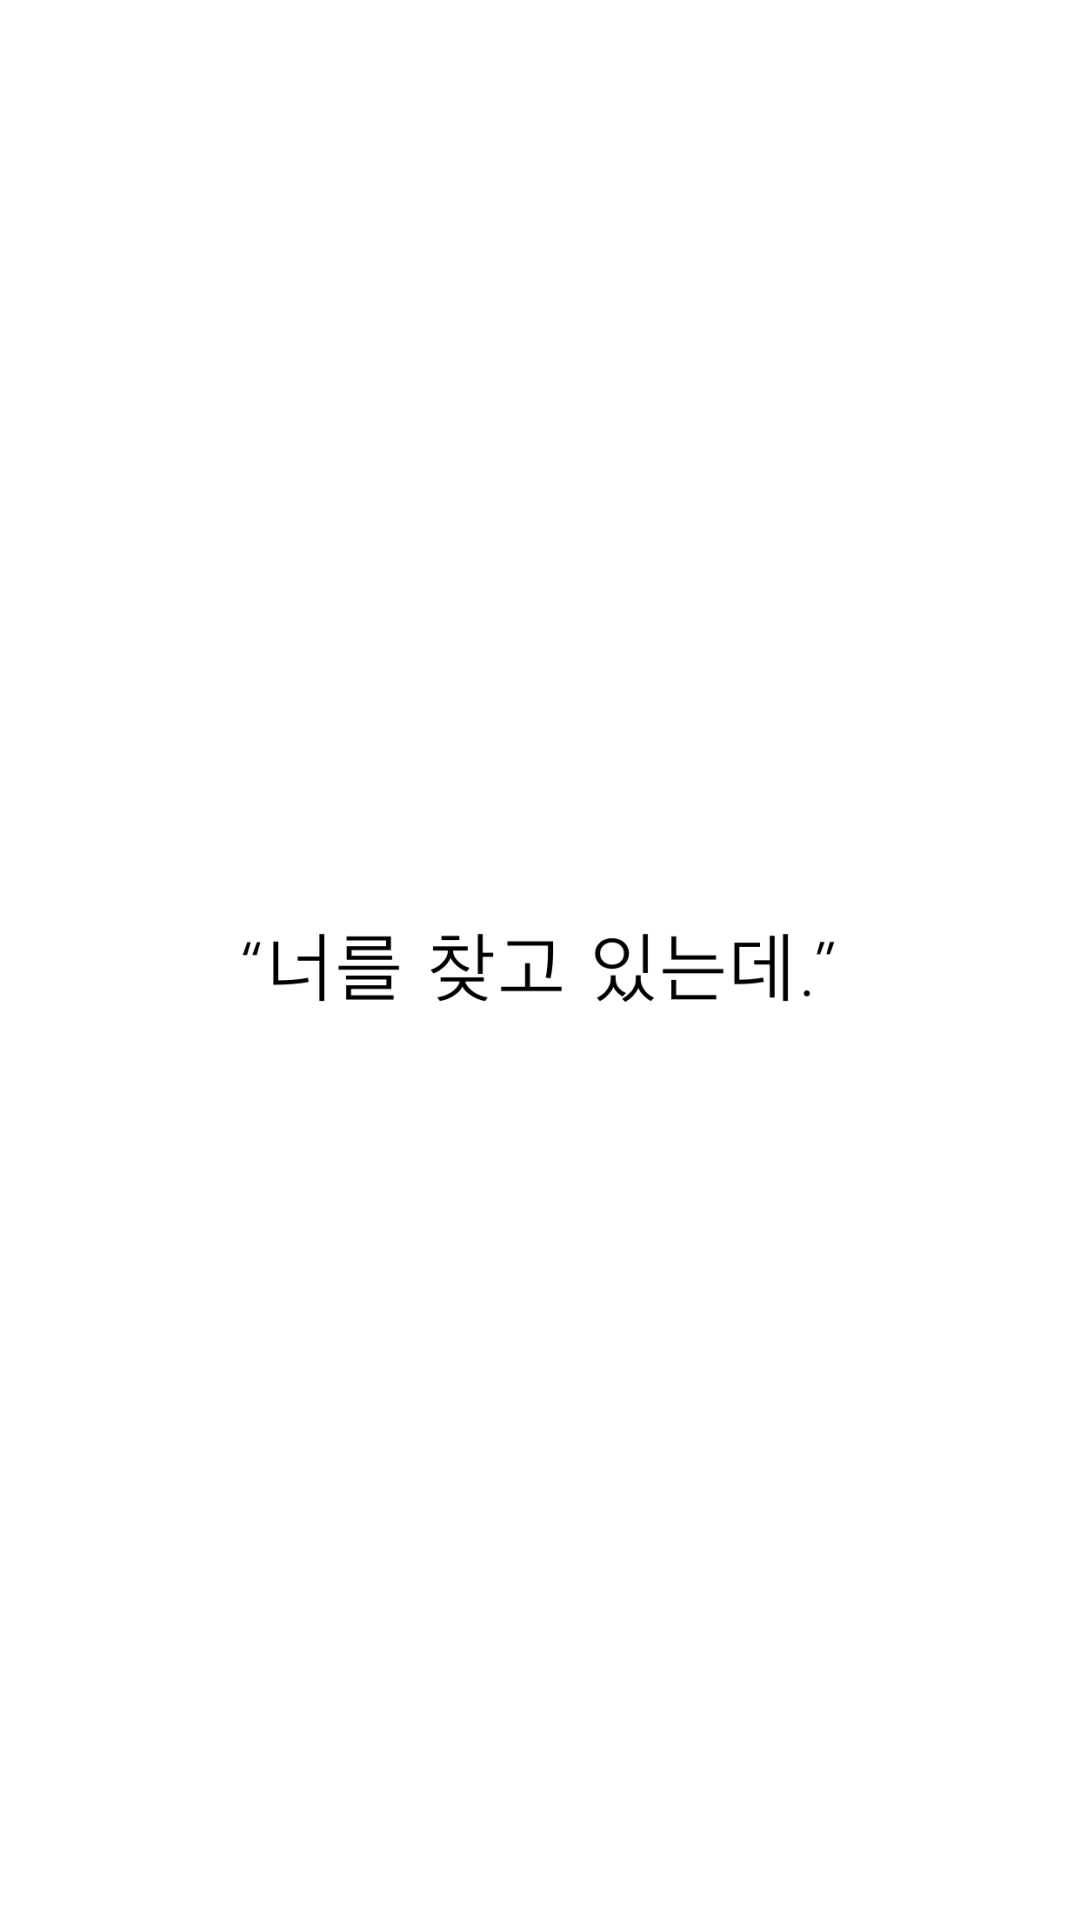 Pin By Kenzajh On Cran Pinterest Wallpaper Kpop And Korean